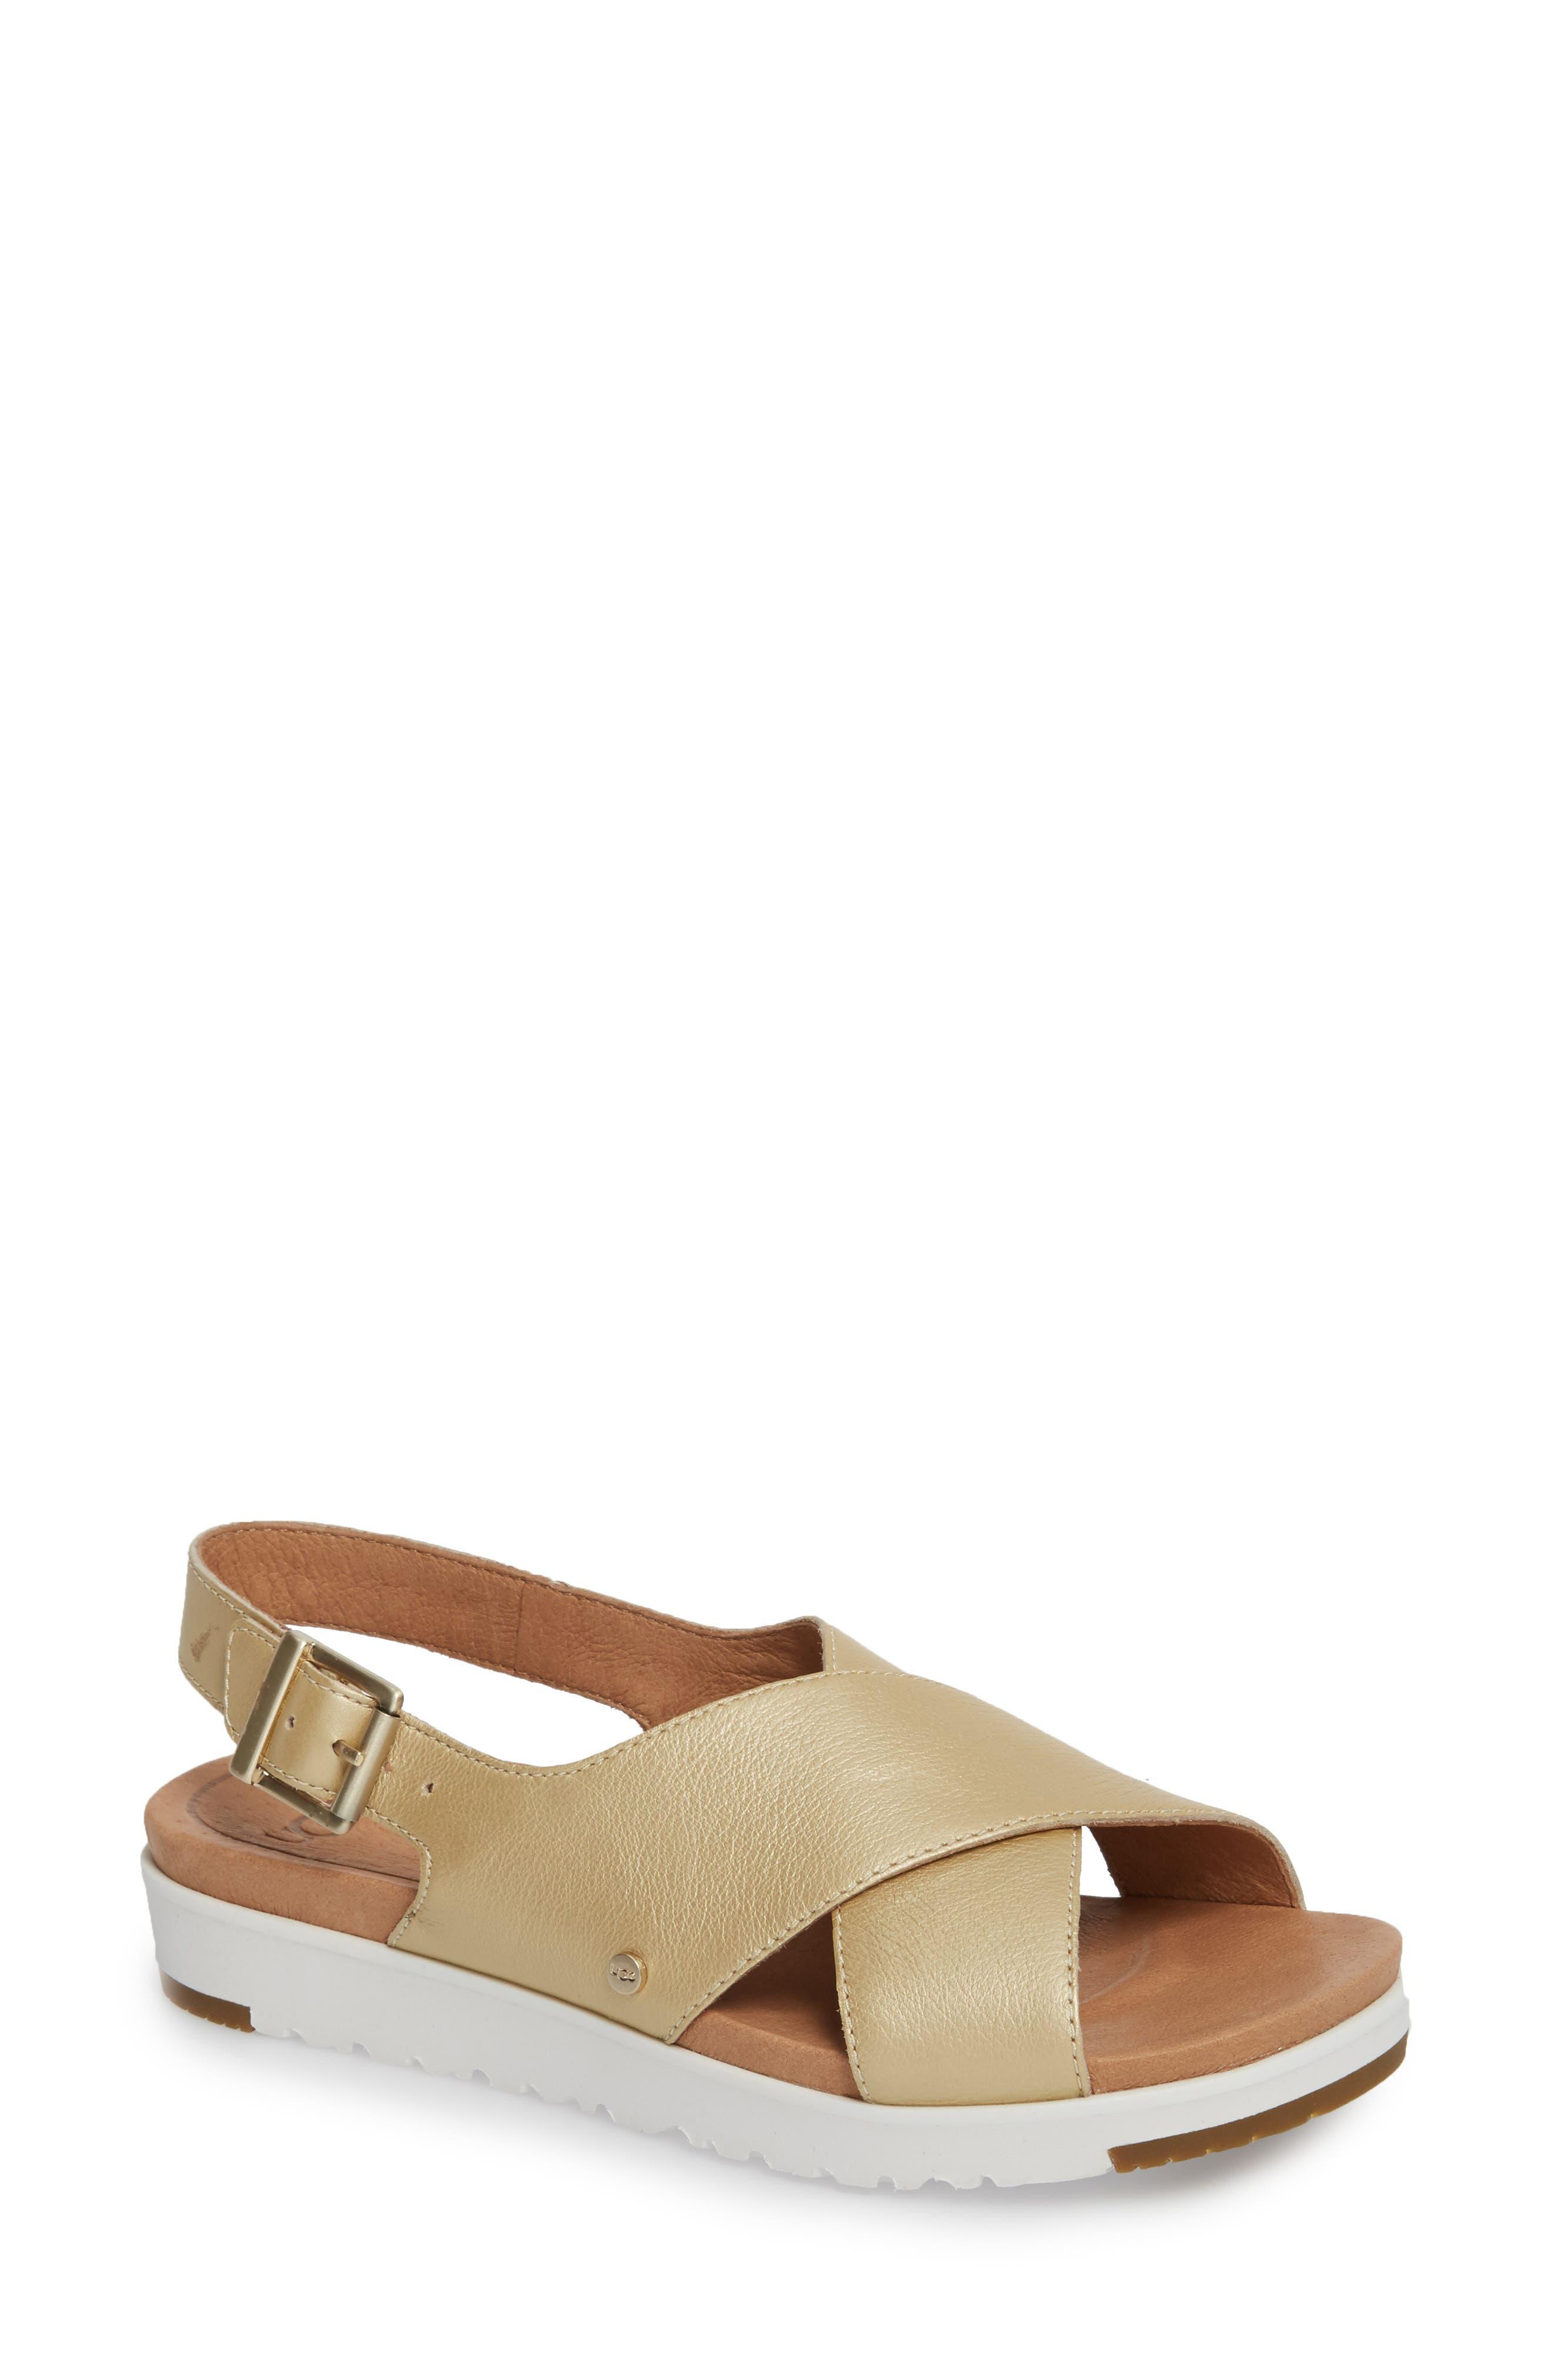 Kamile Slingback Sandal,                         Main,                         color, Gold Leather